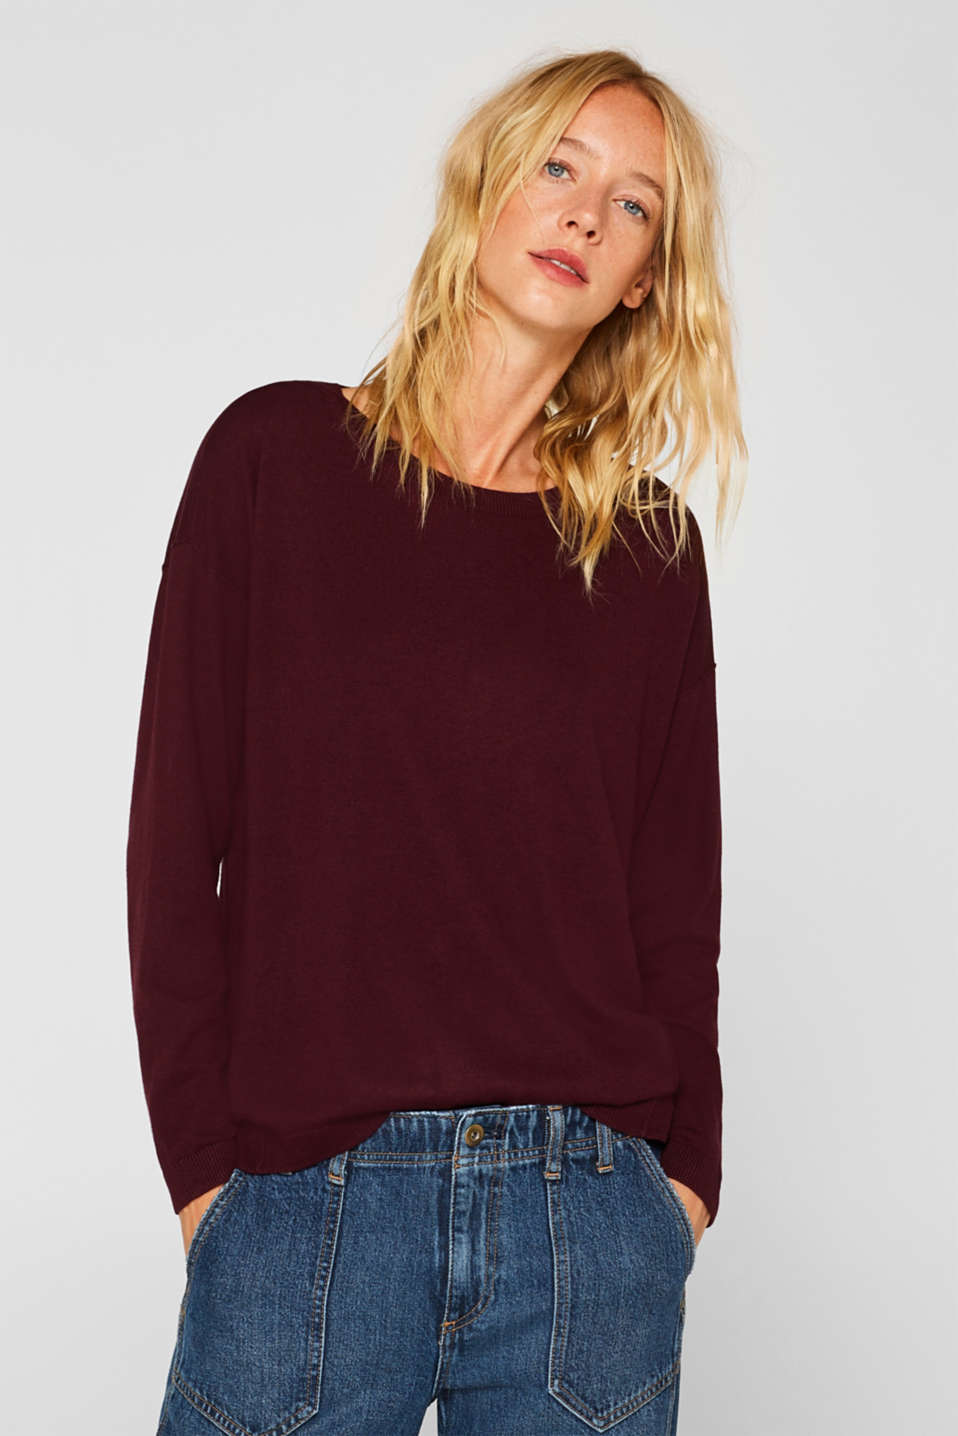 Fine knit jumper with on-trend details, BORDEAUX RED, detail image number 0